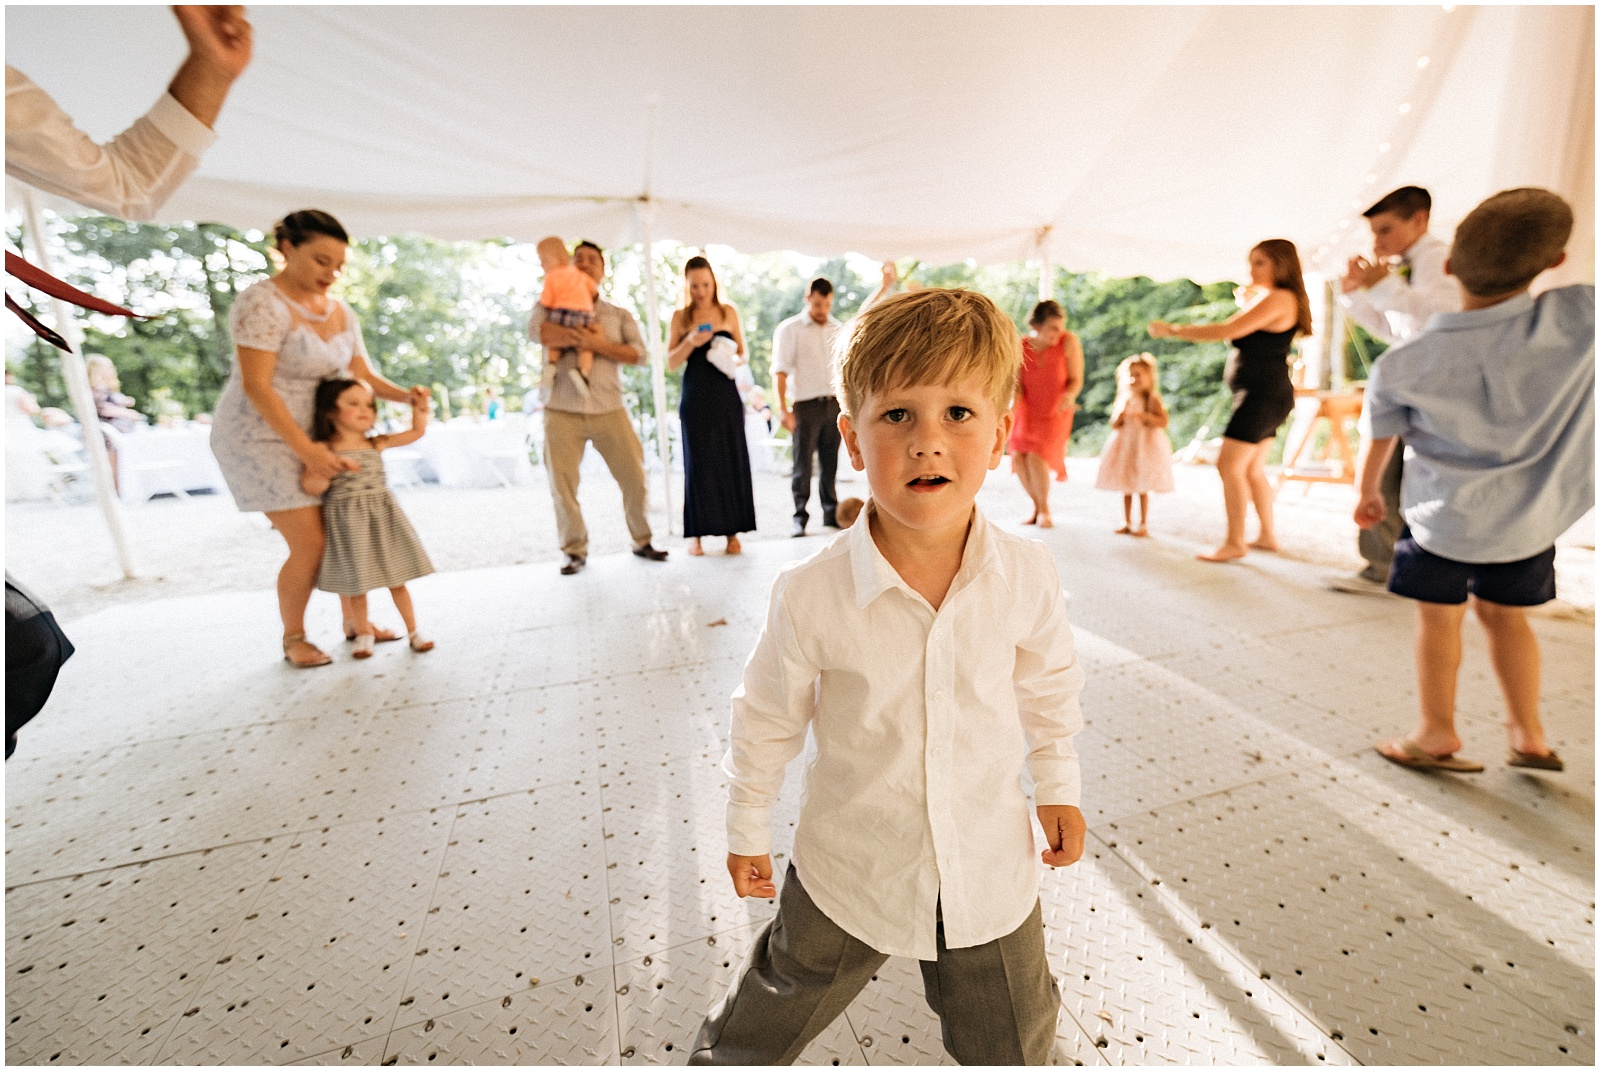 Ryan_Rechelle_Nantahalla_Weddings_Andrews_NC-144_Ryan_Rechelle_McGuire's_Millrace_Andrews_NC.jpg